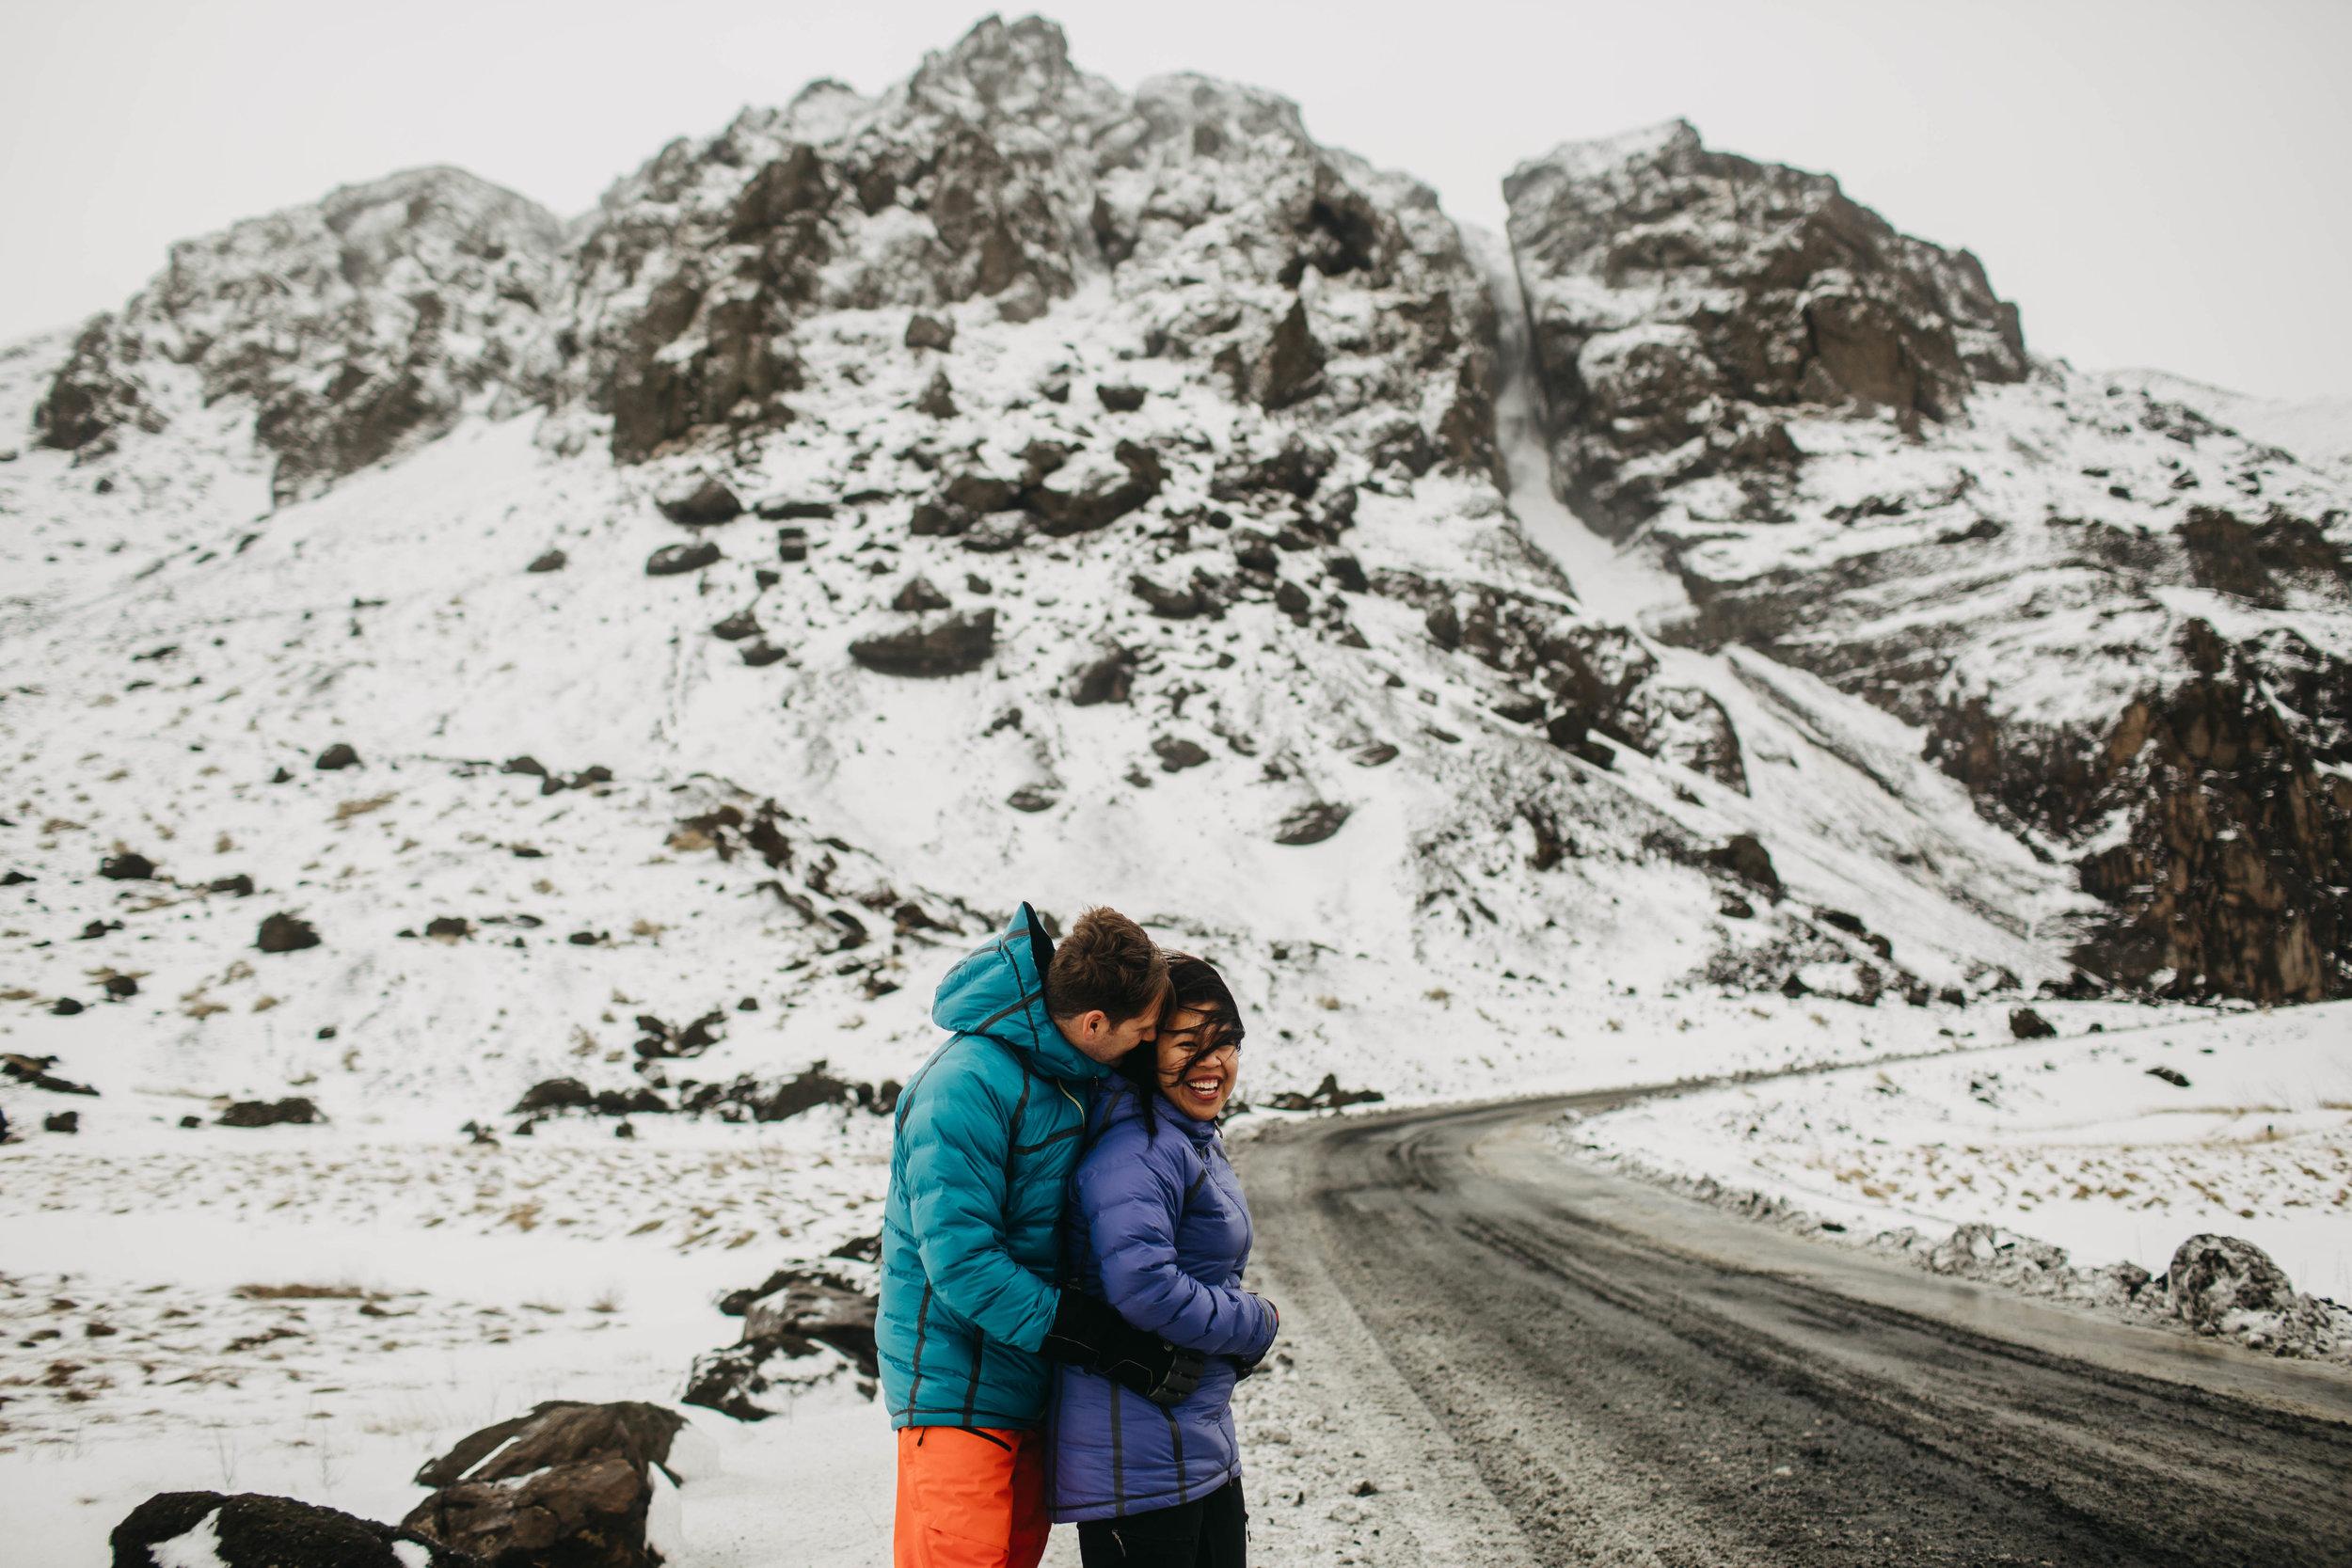 ICELAND ADVENTURE | LEANNE & JEAN PAUL